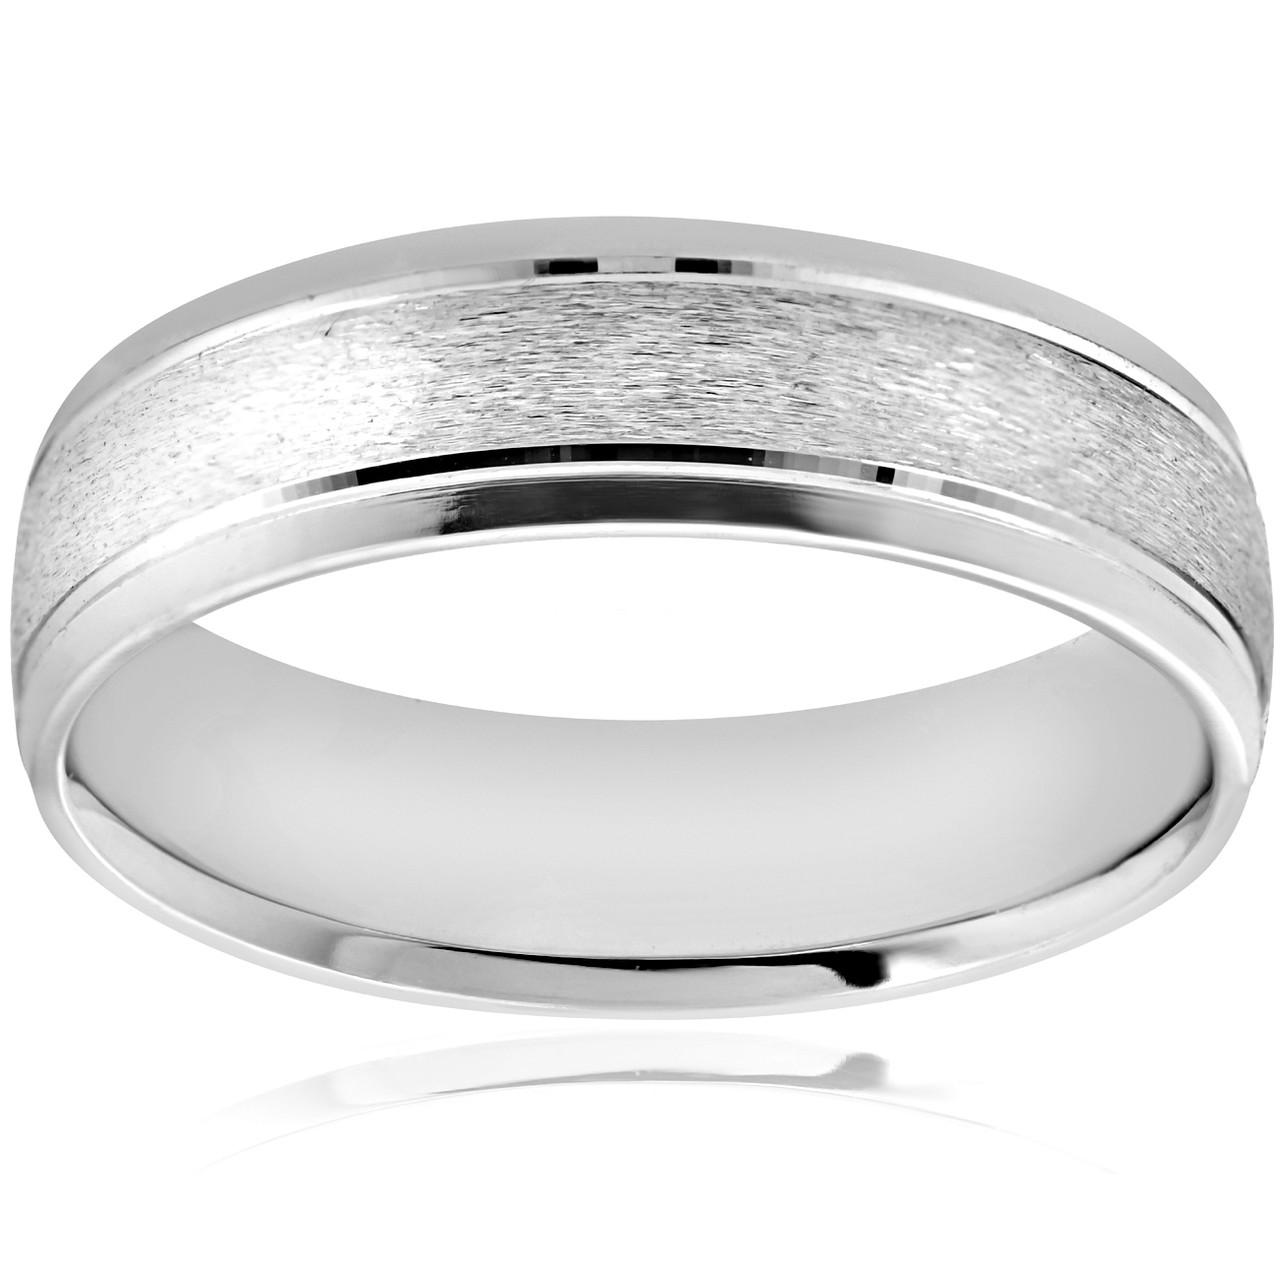 6MM Platinum Mens Wedding Band Brushed Comfort Fit Flat Ring